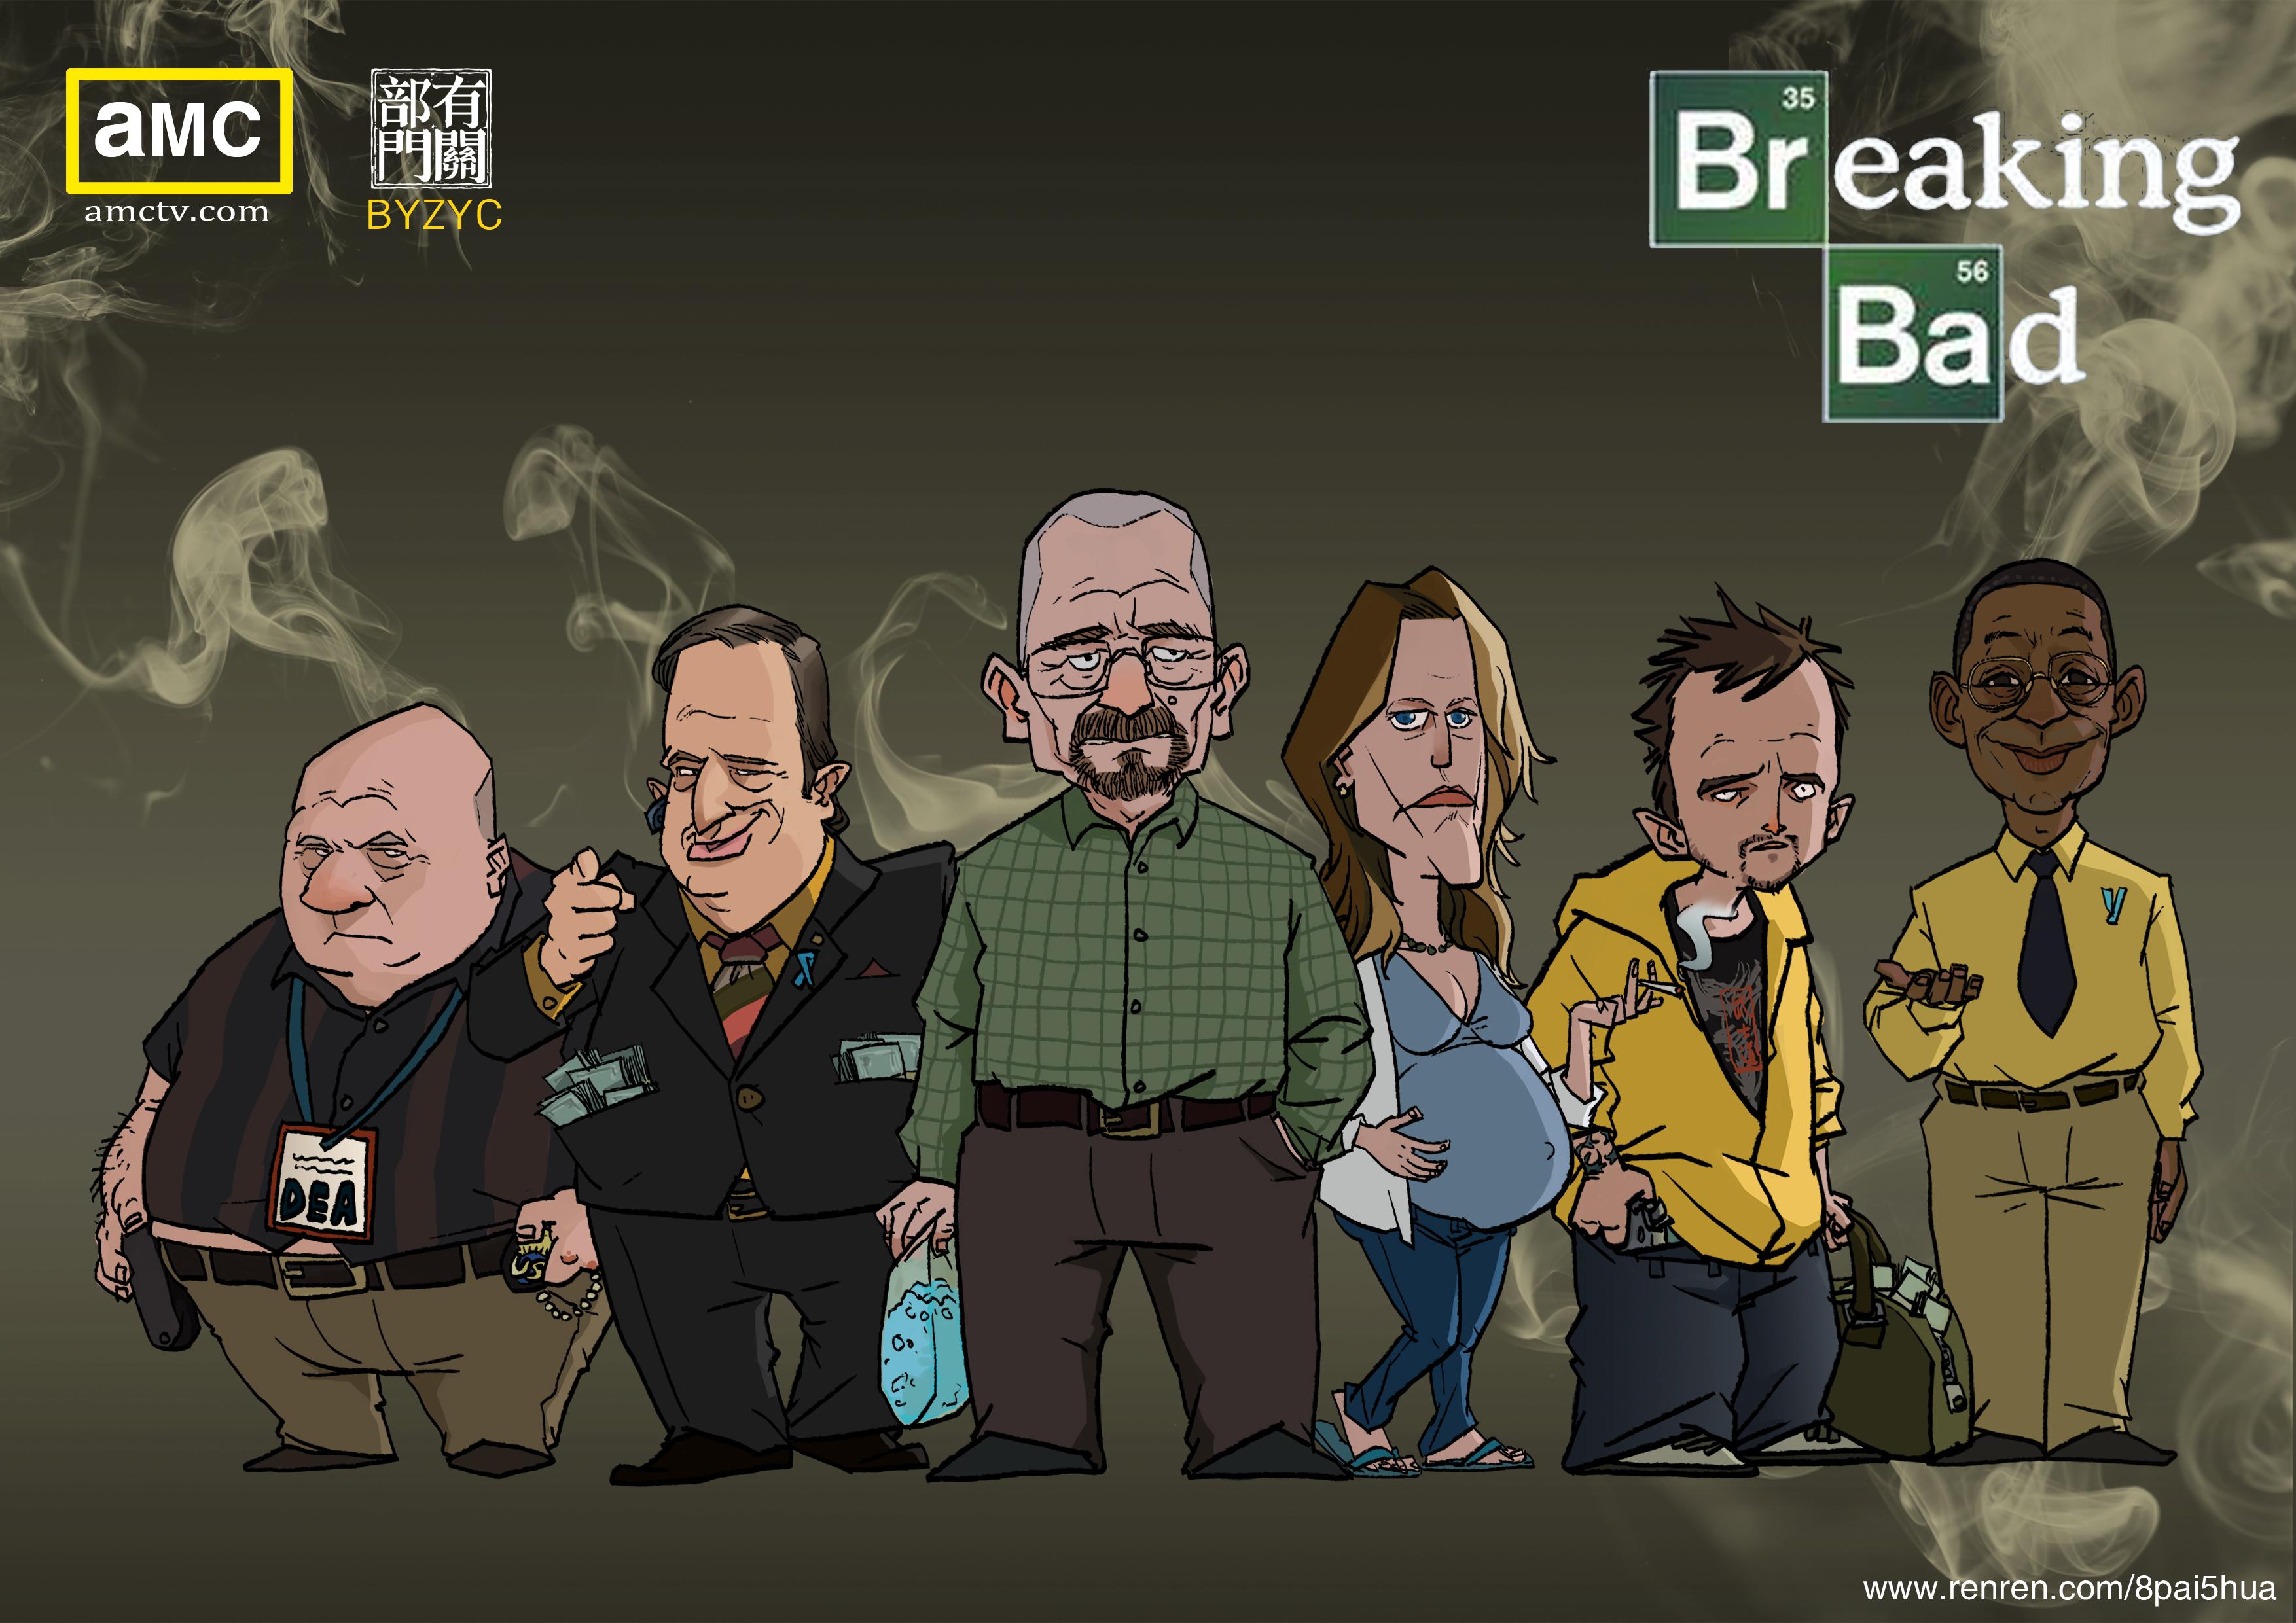 Stunning Breaking Bad Cuarta Temporada Images - Casas: Ideas ...